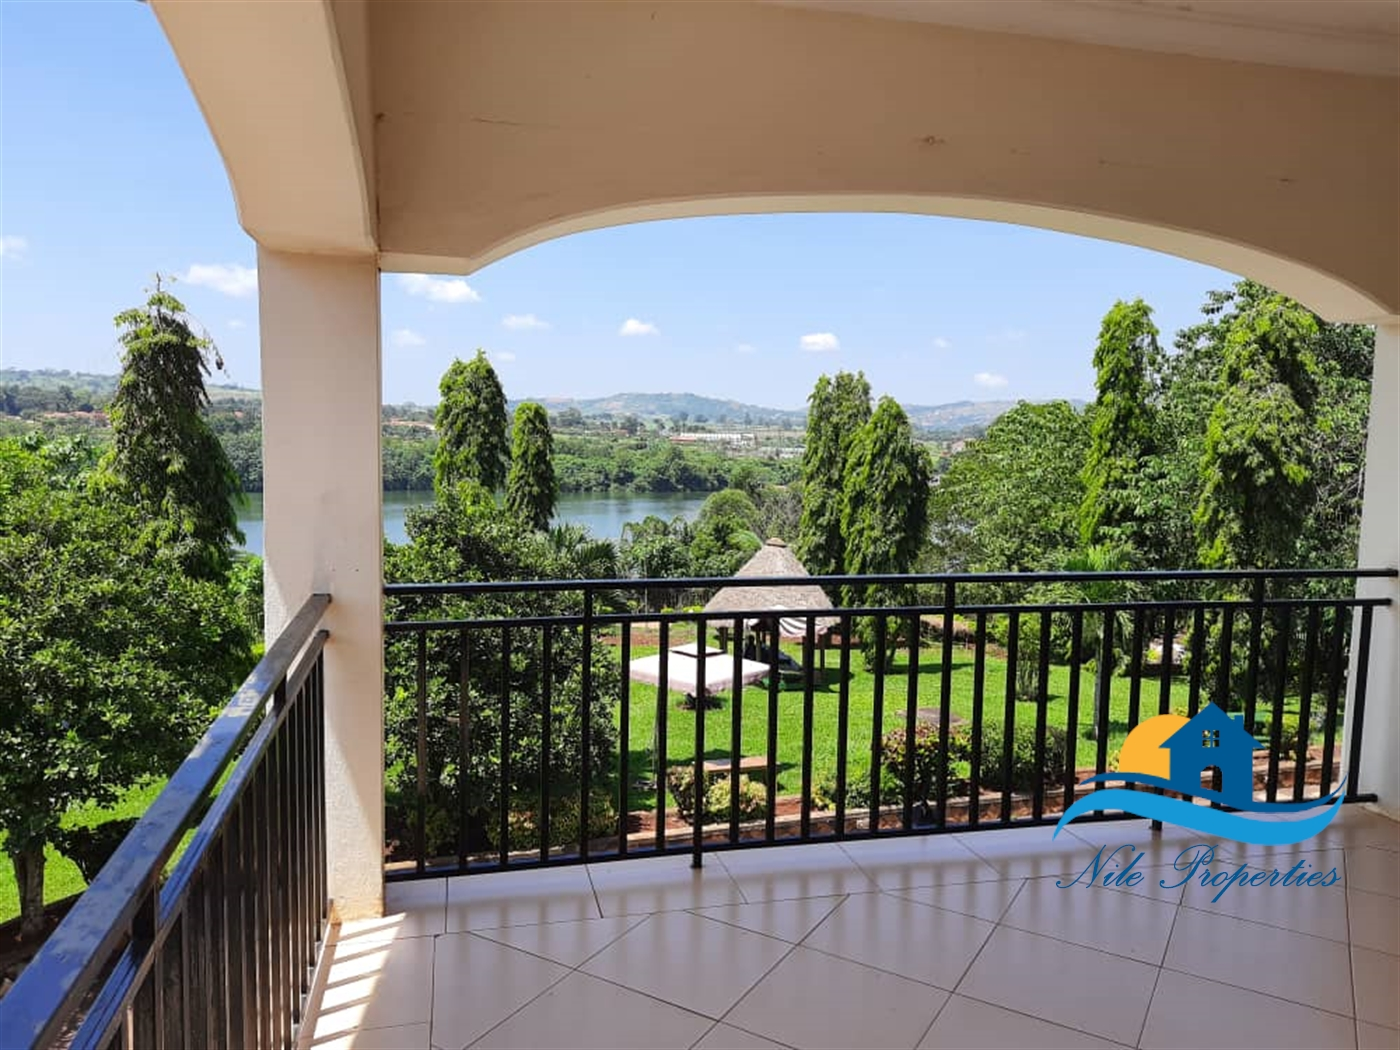 Office Space for rent in Kiira Jinja